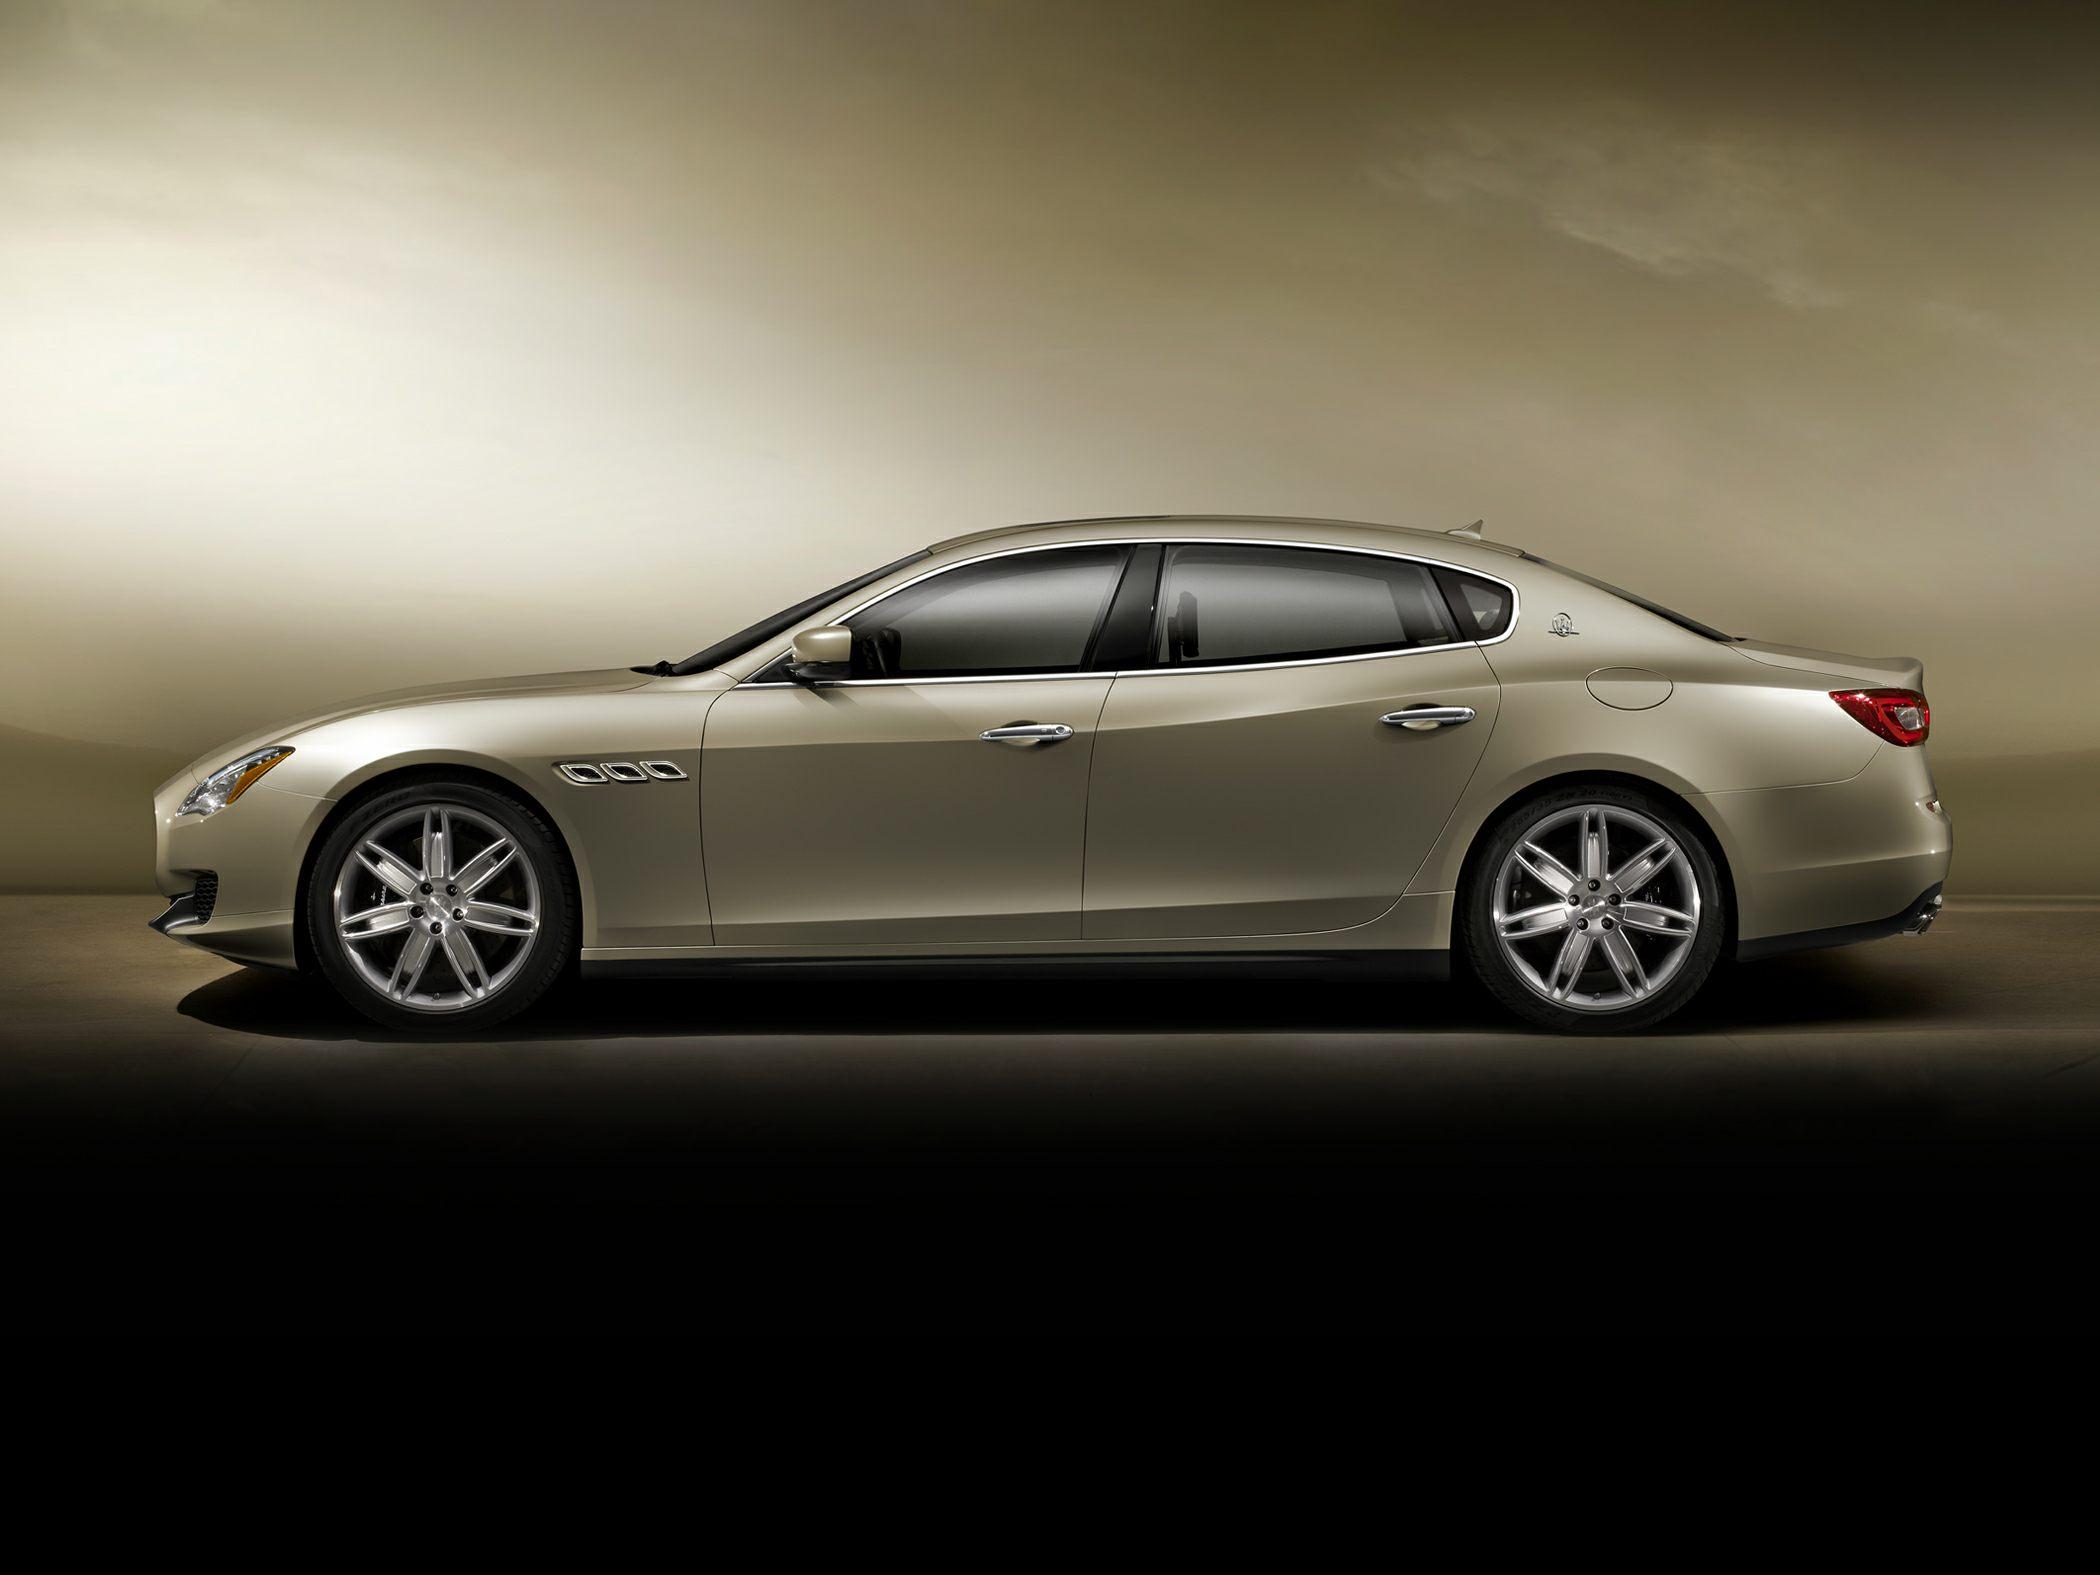 2019 Maserati Quattroporte Deals Prices Incentives Leases